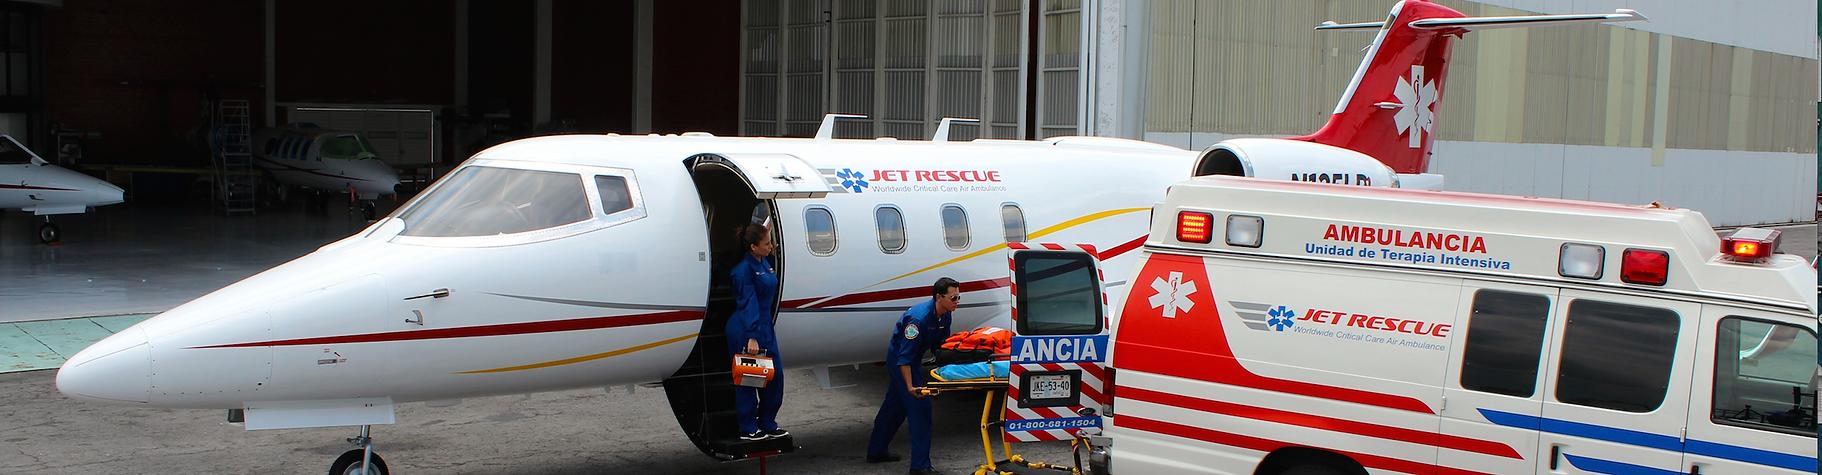 Ambulancia aerea guadalajara